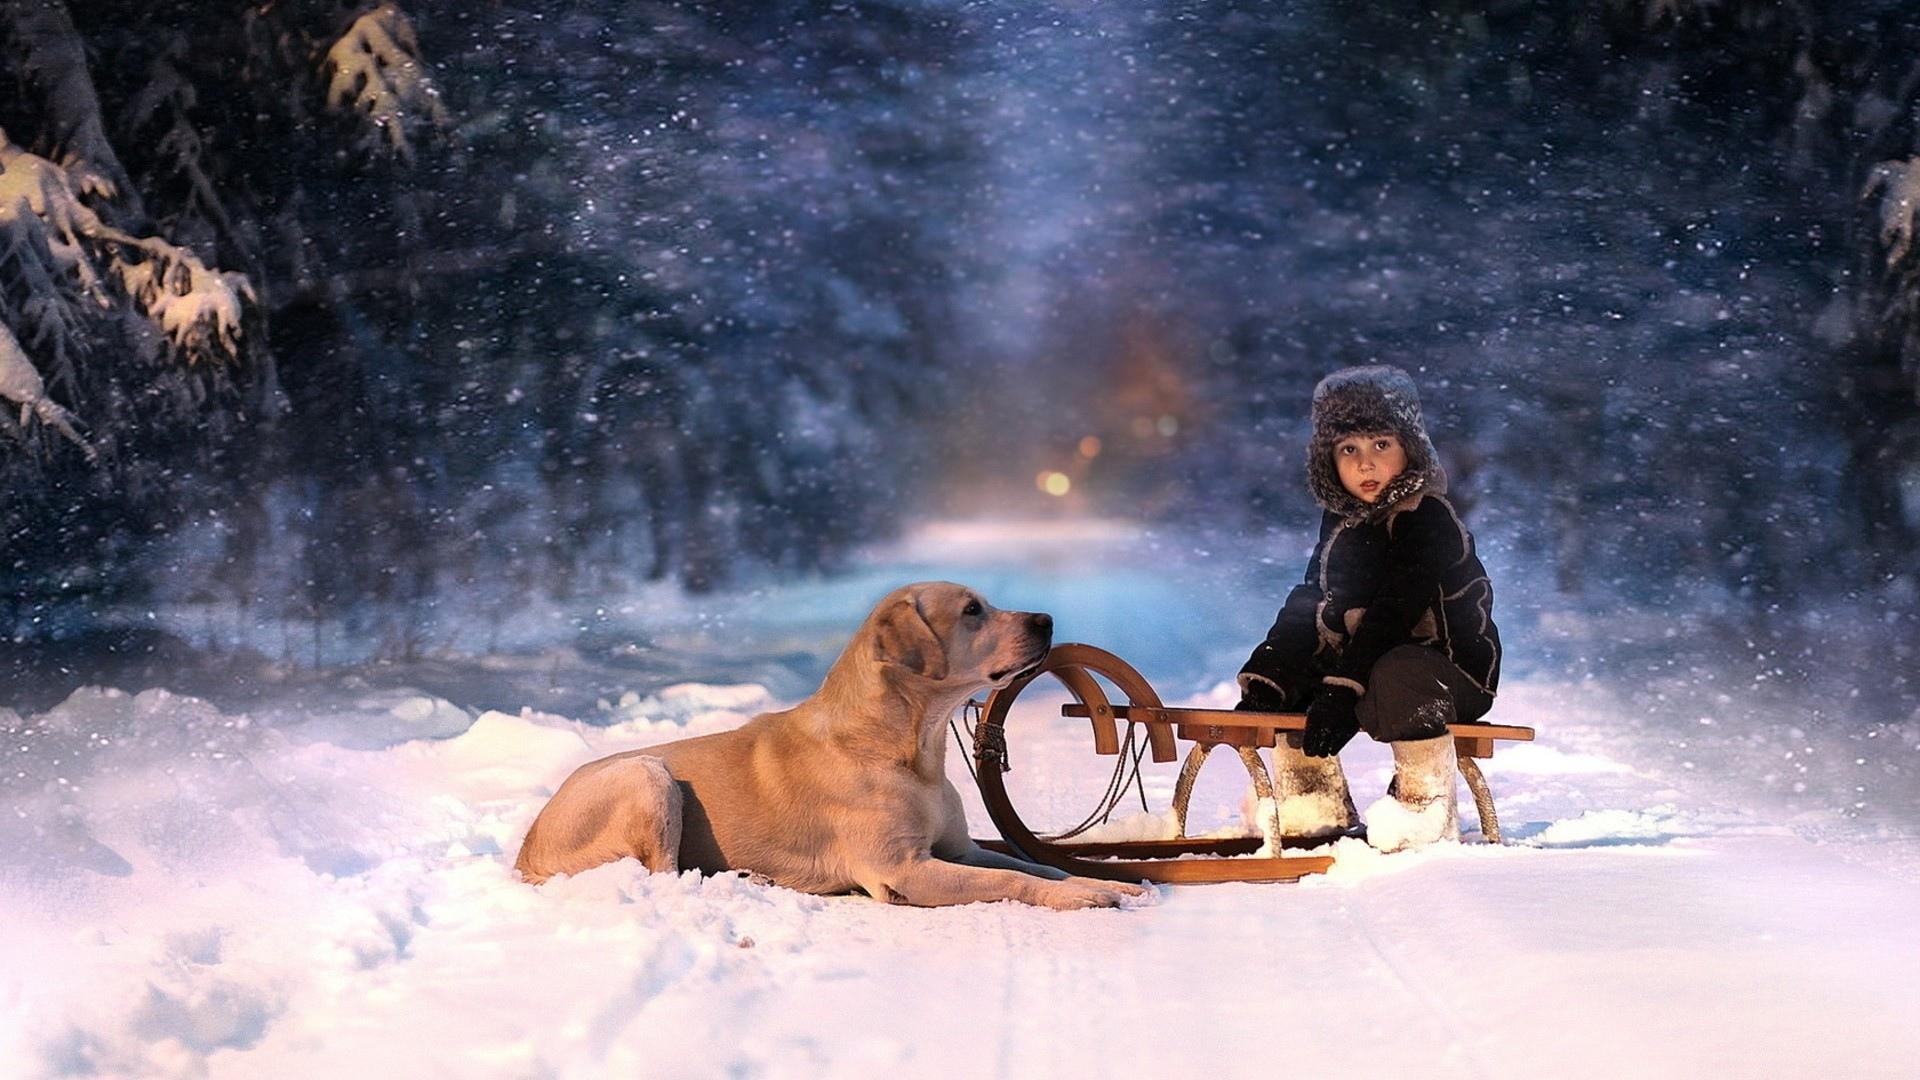 holidays christmas winter snow seasons seasonal roads snowing 1920x1080